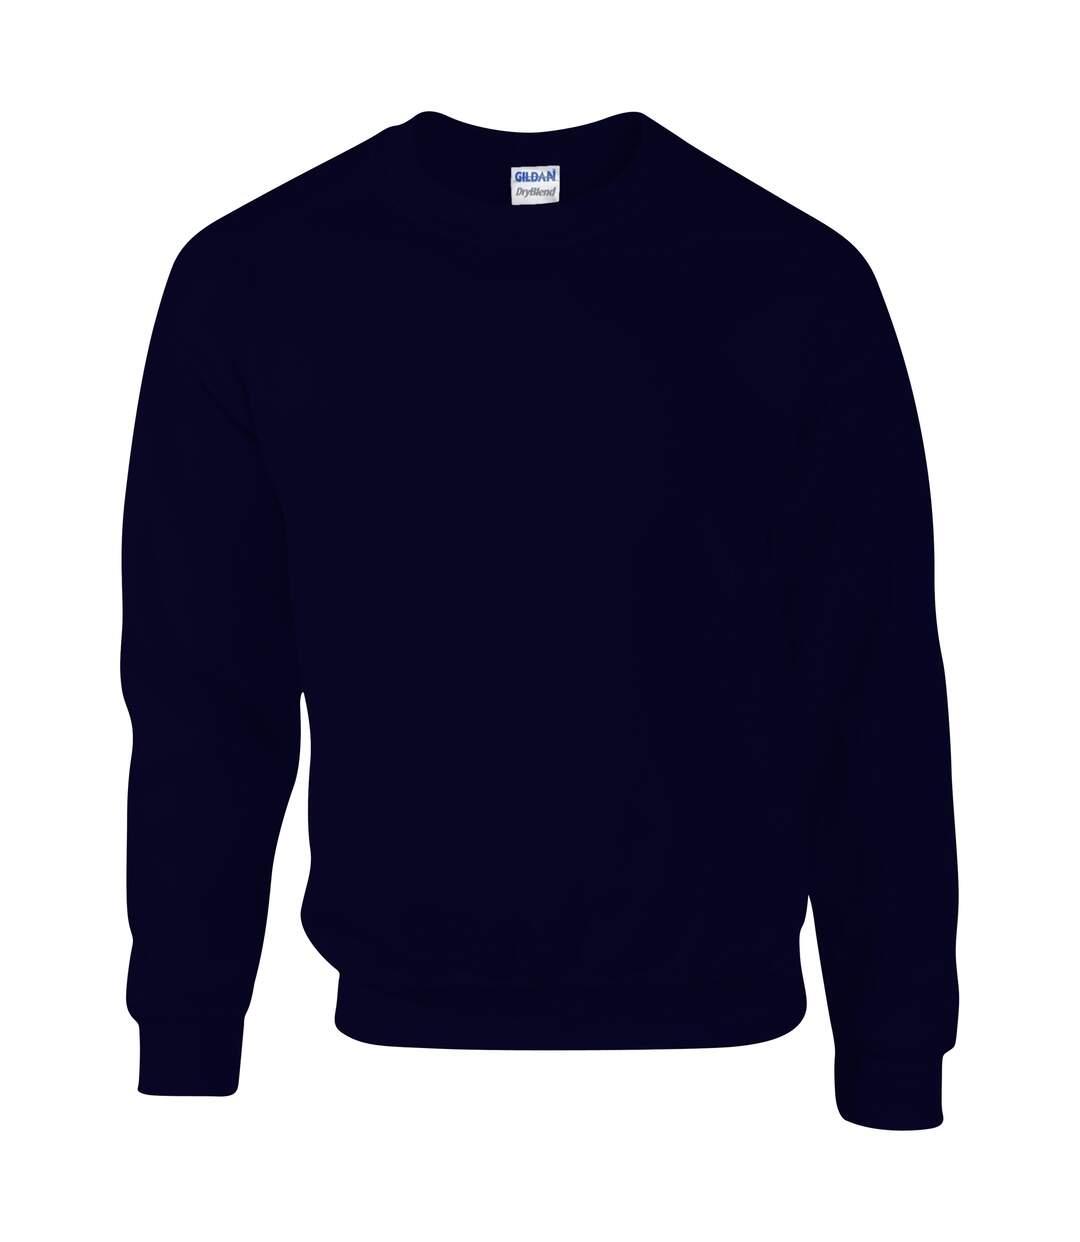 Gildan DryBlend Adult Set-In Crew Neck Sweatshirt (13 Colours) (Black) - UTBC459